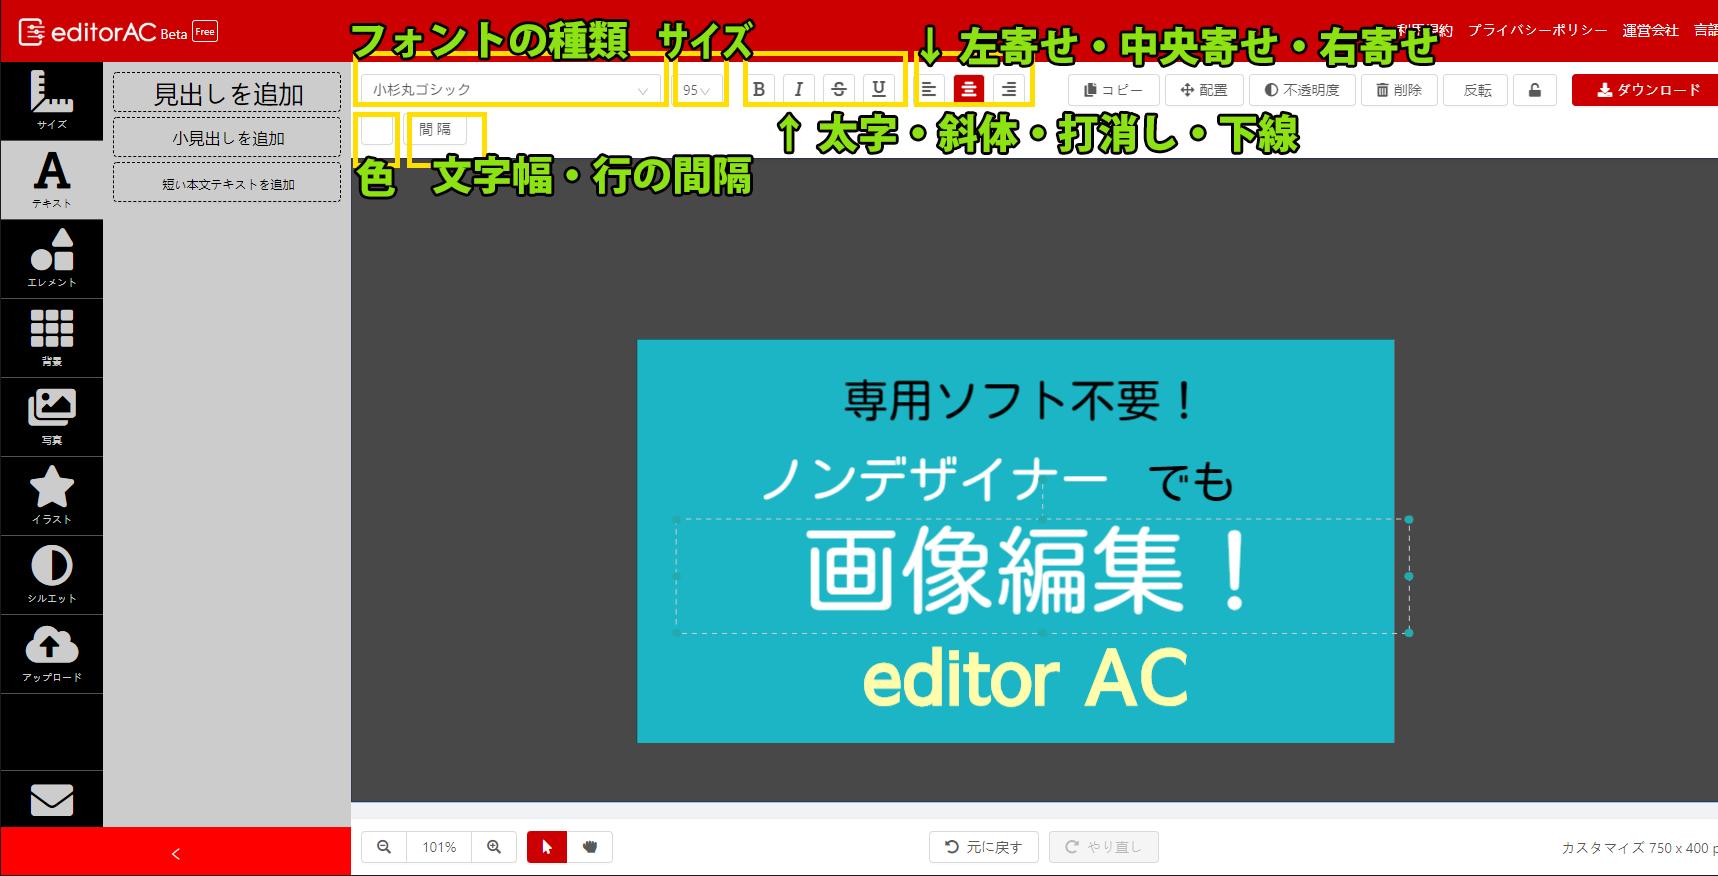 無料&会員登録不要!画像作成ツール【editor AC】の使用方法を解説